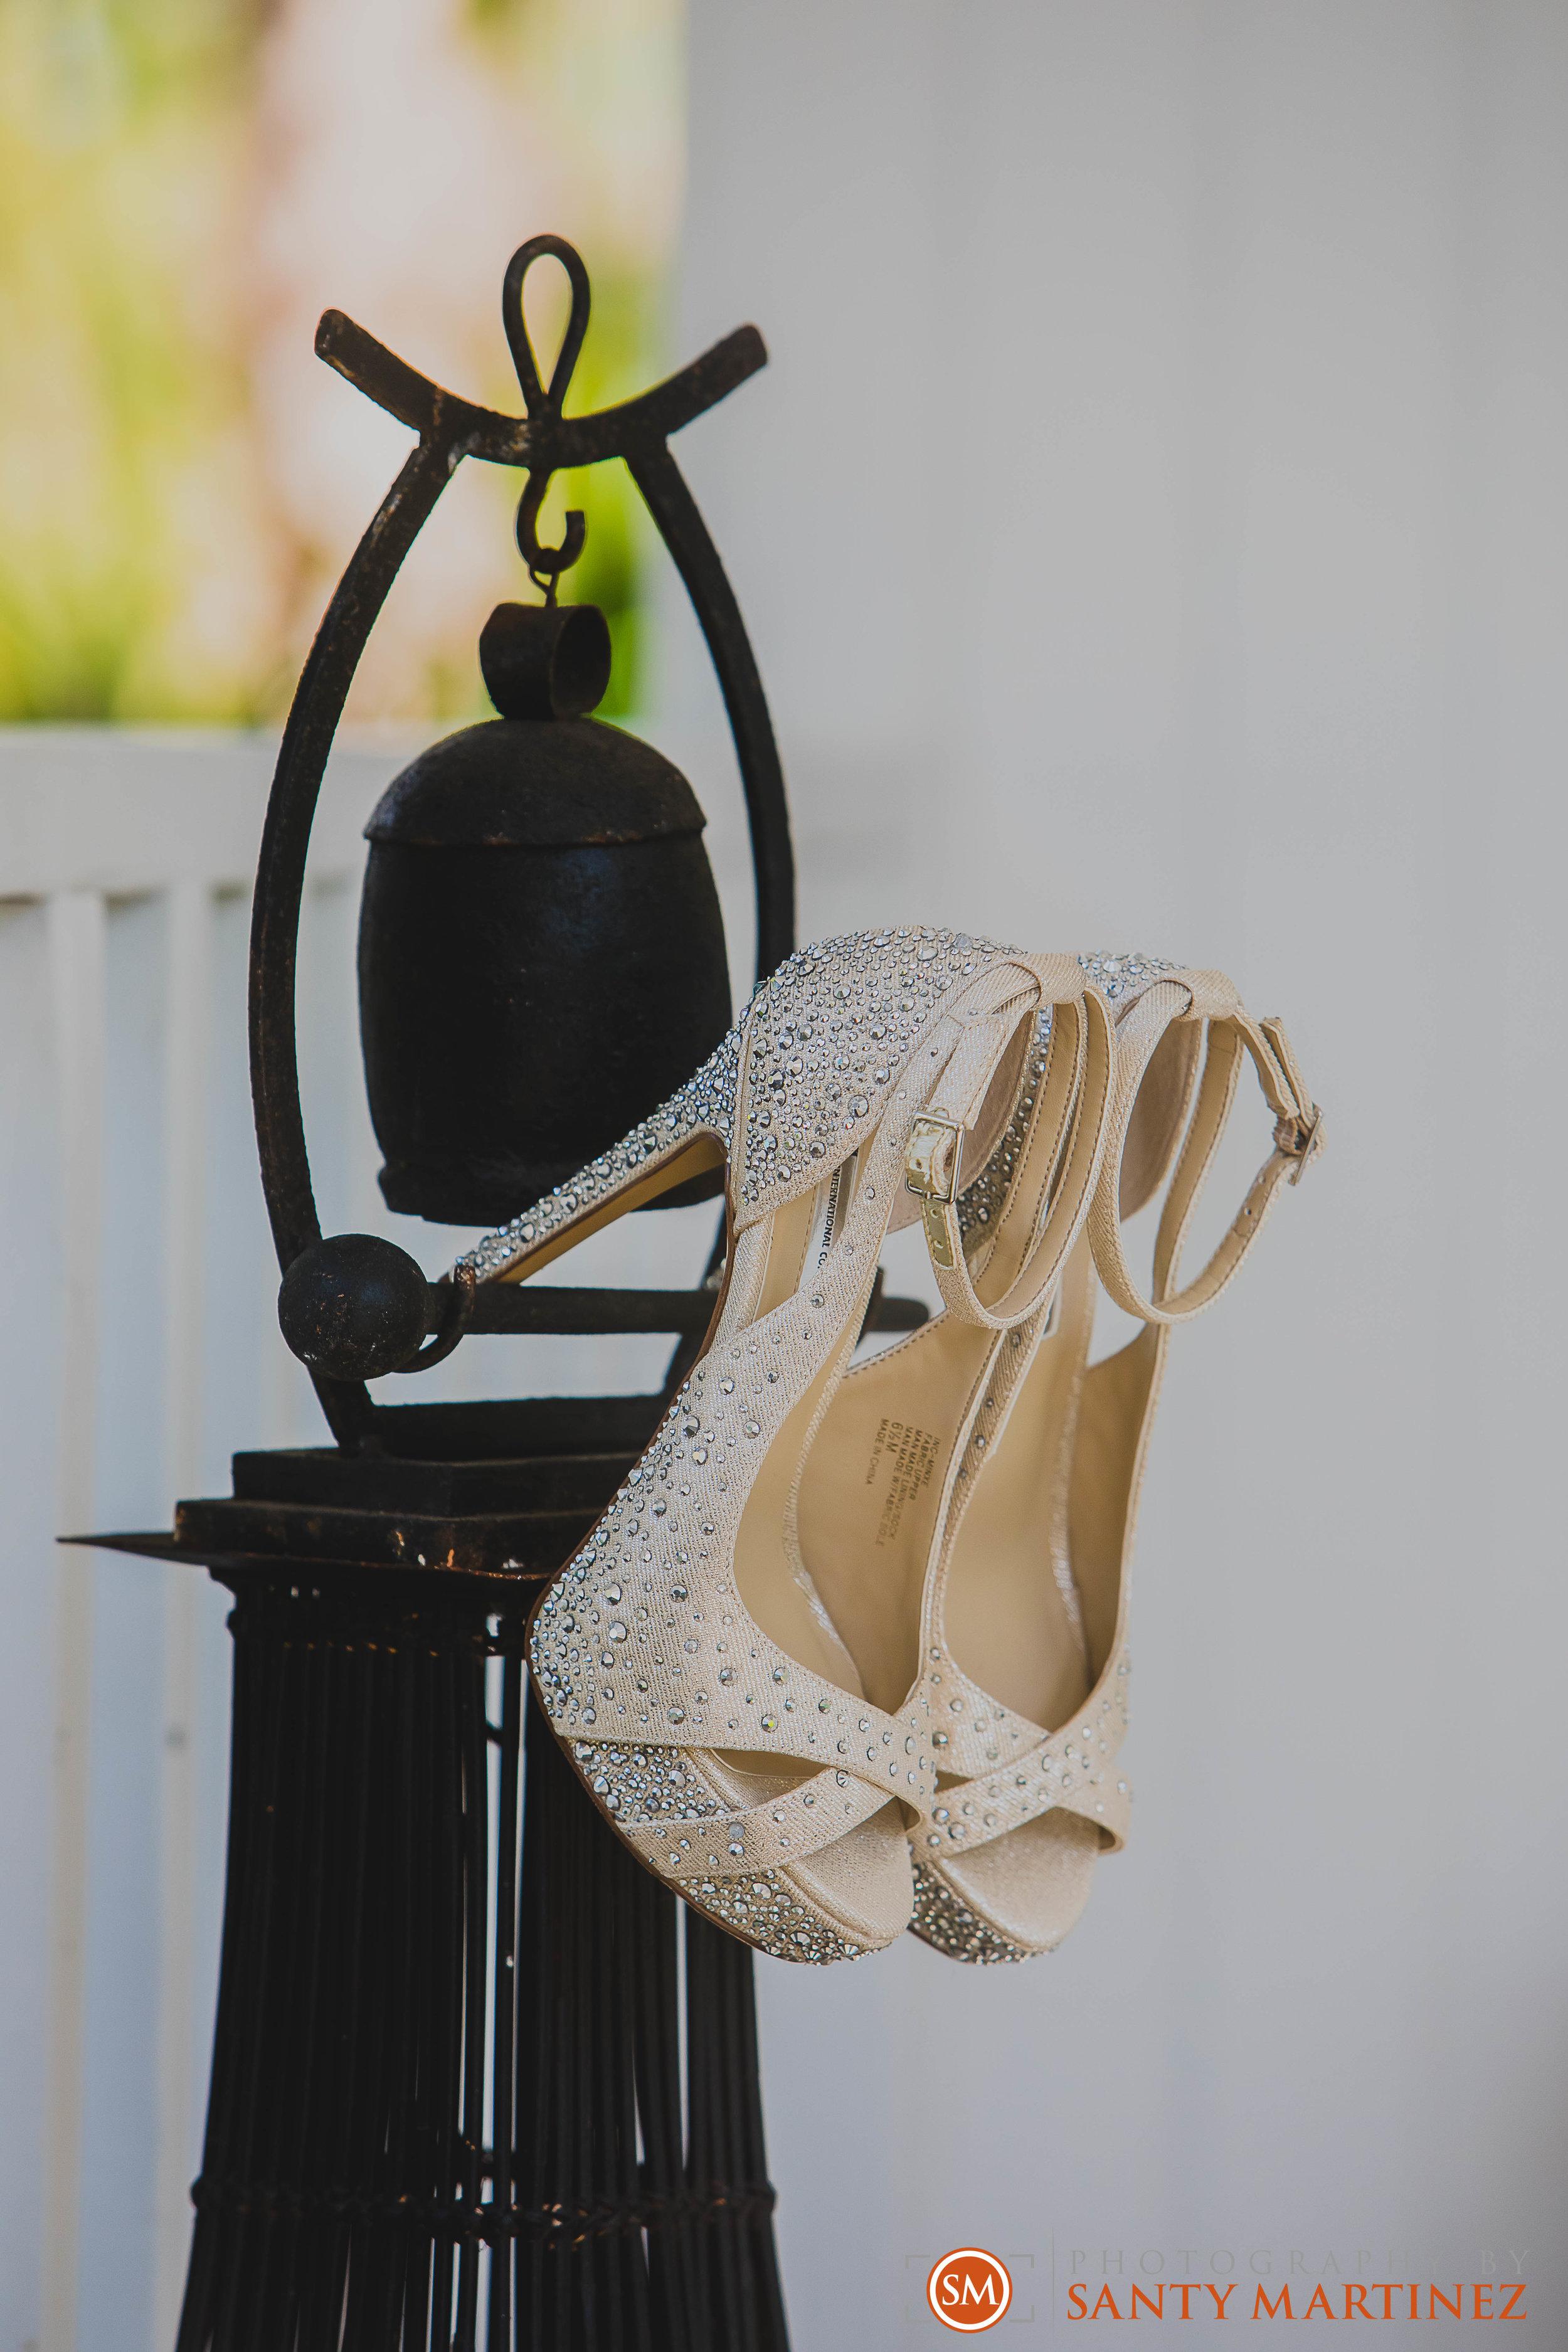 Wedding - Whimsical key West House - Photography by Santy Martinez-4.jpg